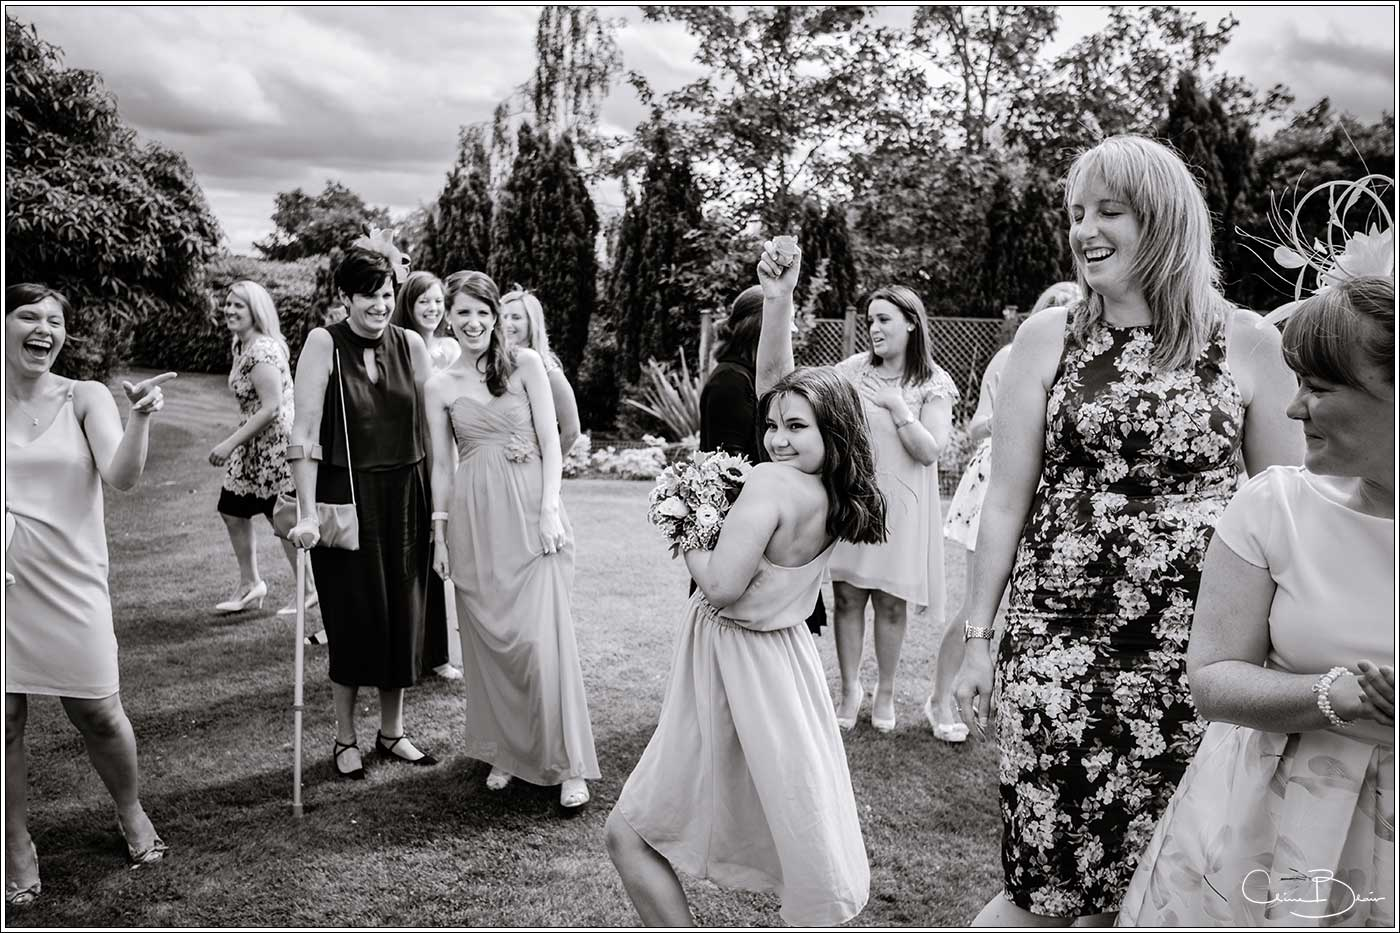 Girl who caught bride's bouquet: Bank House Wedding Photographer Clive Blair Photography. Documentary Birmingham Wedding Photographer